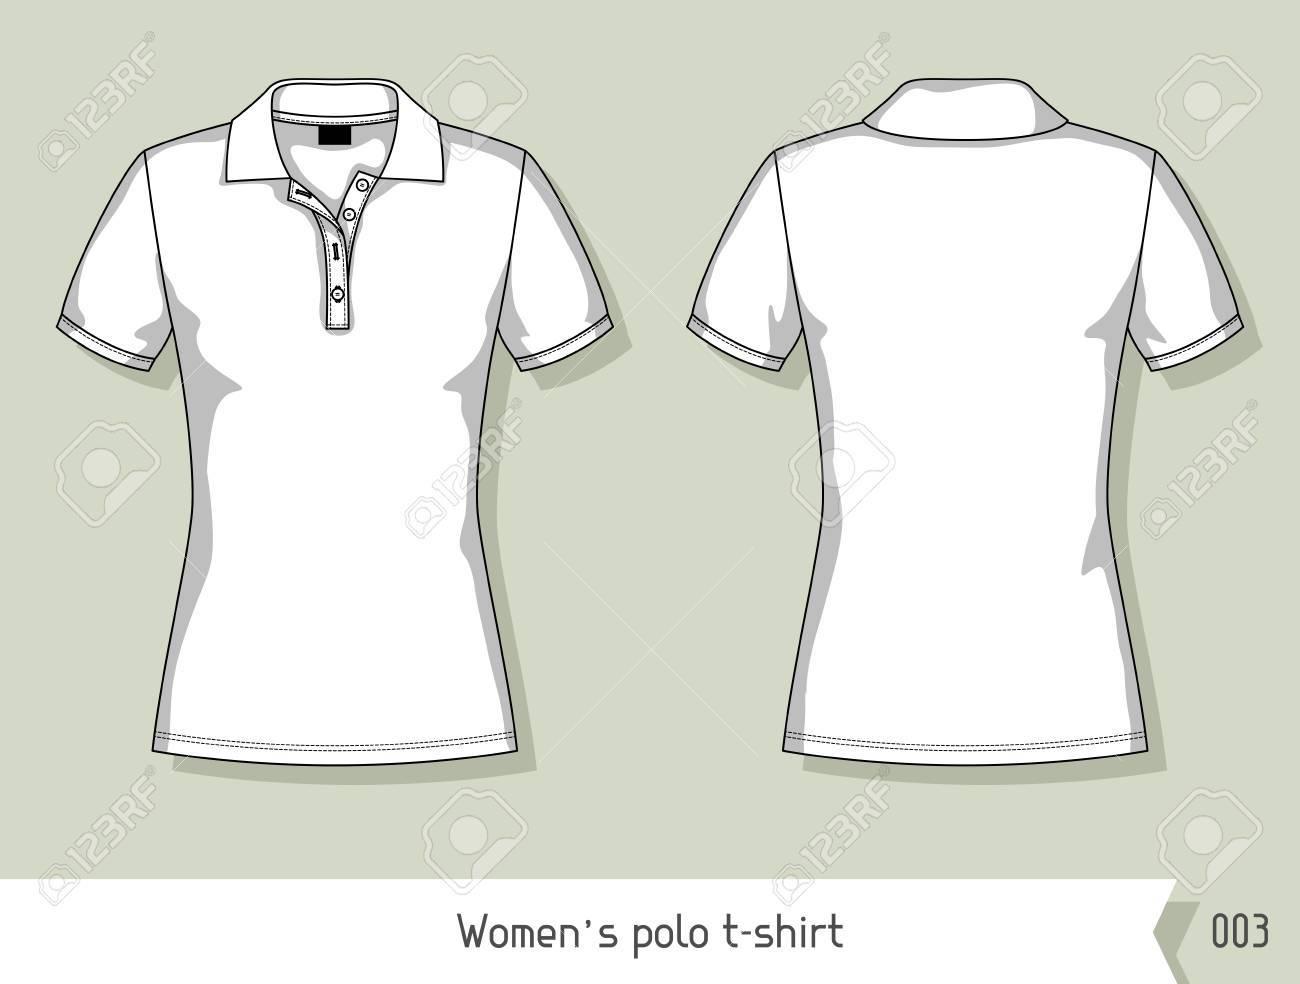 Design A Shirt Template | Frauen Polo T Shirt Vorlage Fur Das Design Leicht Bearbeitbaren